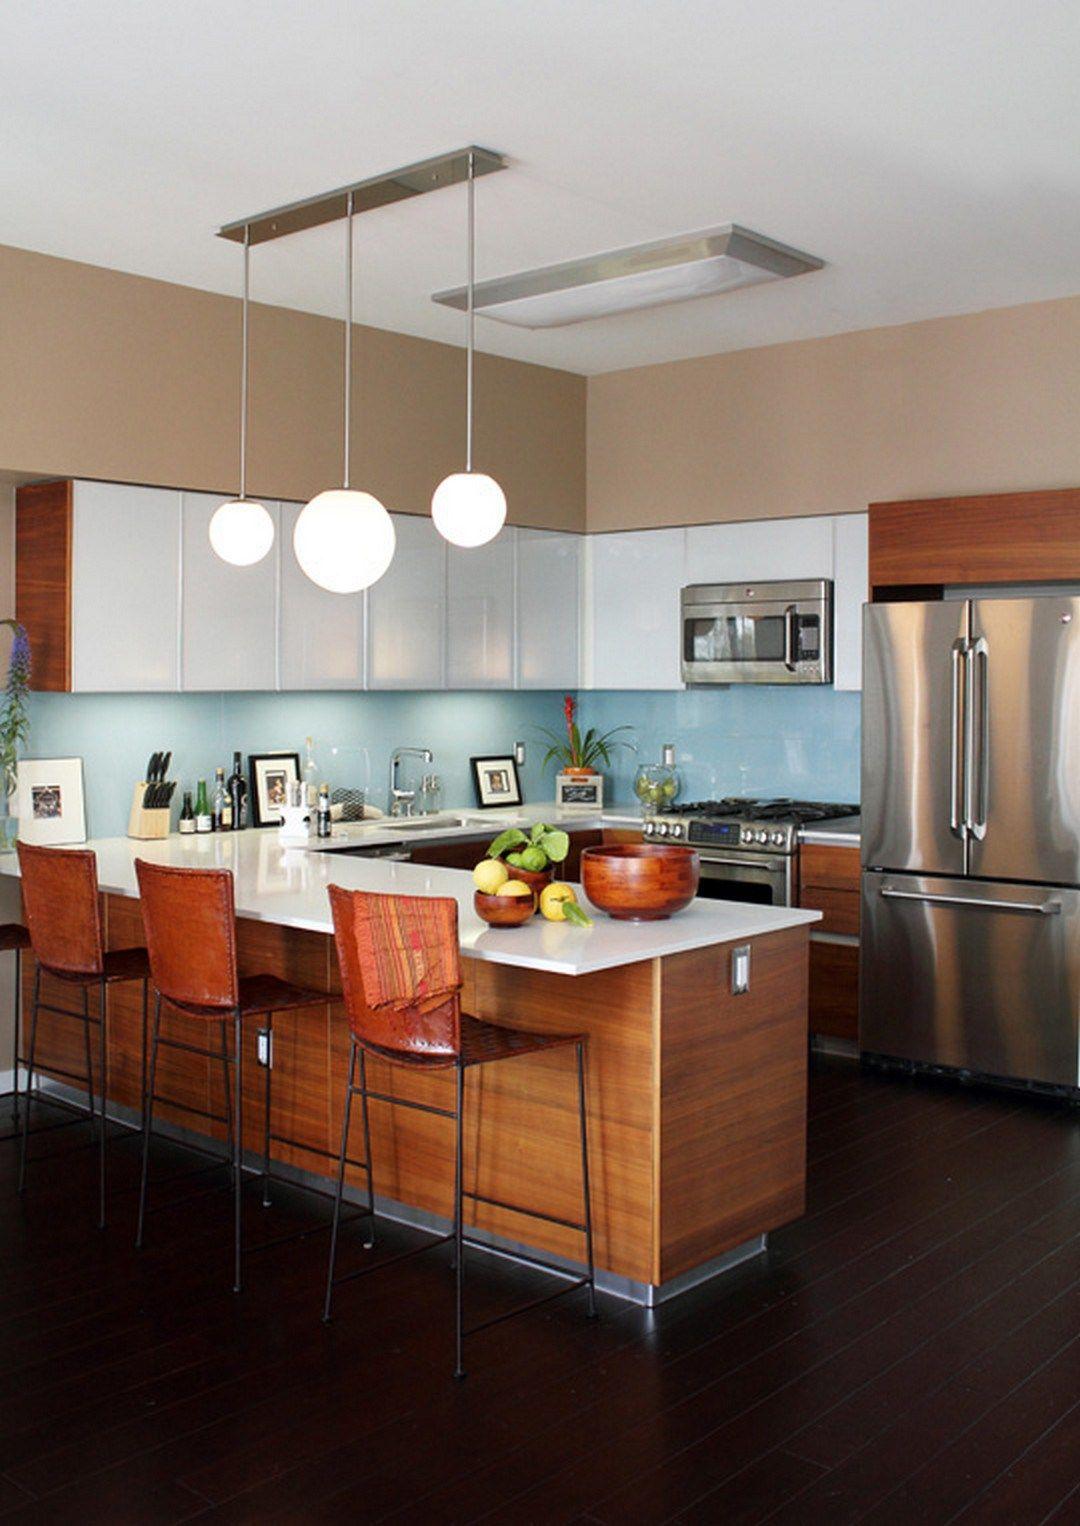 99 Mid Century Modern Kitchen Remodel Decorating Ideas 28 Mid